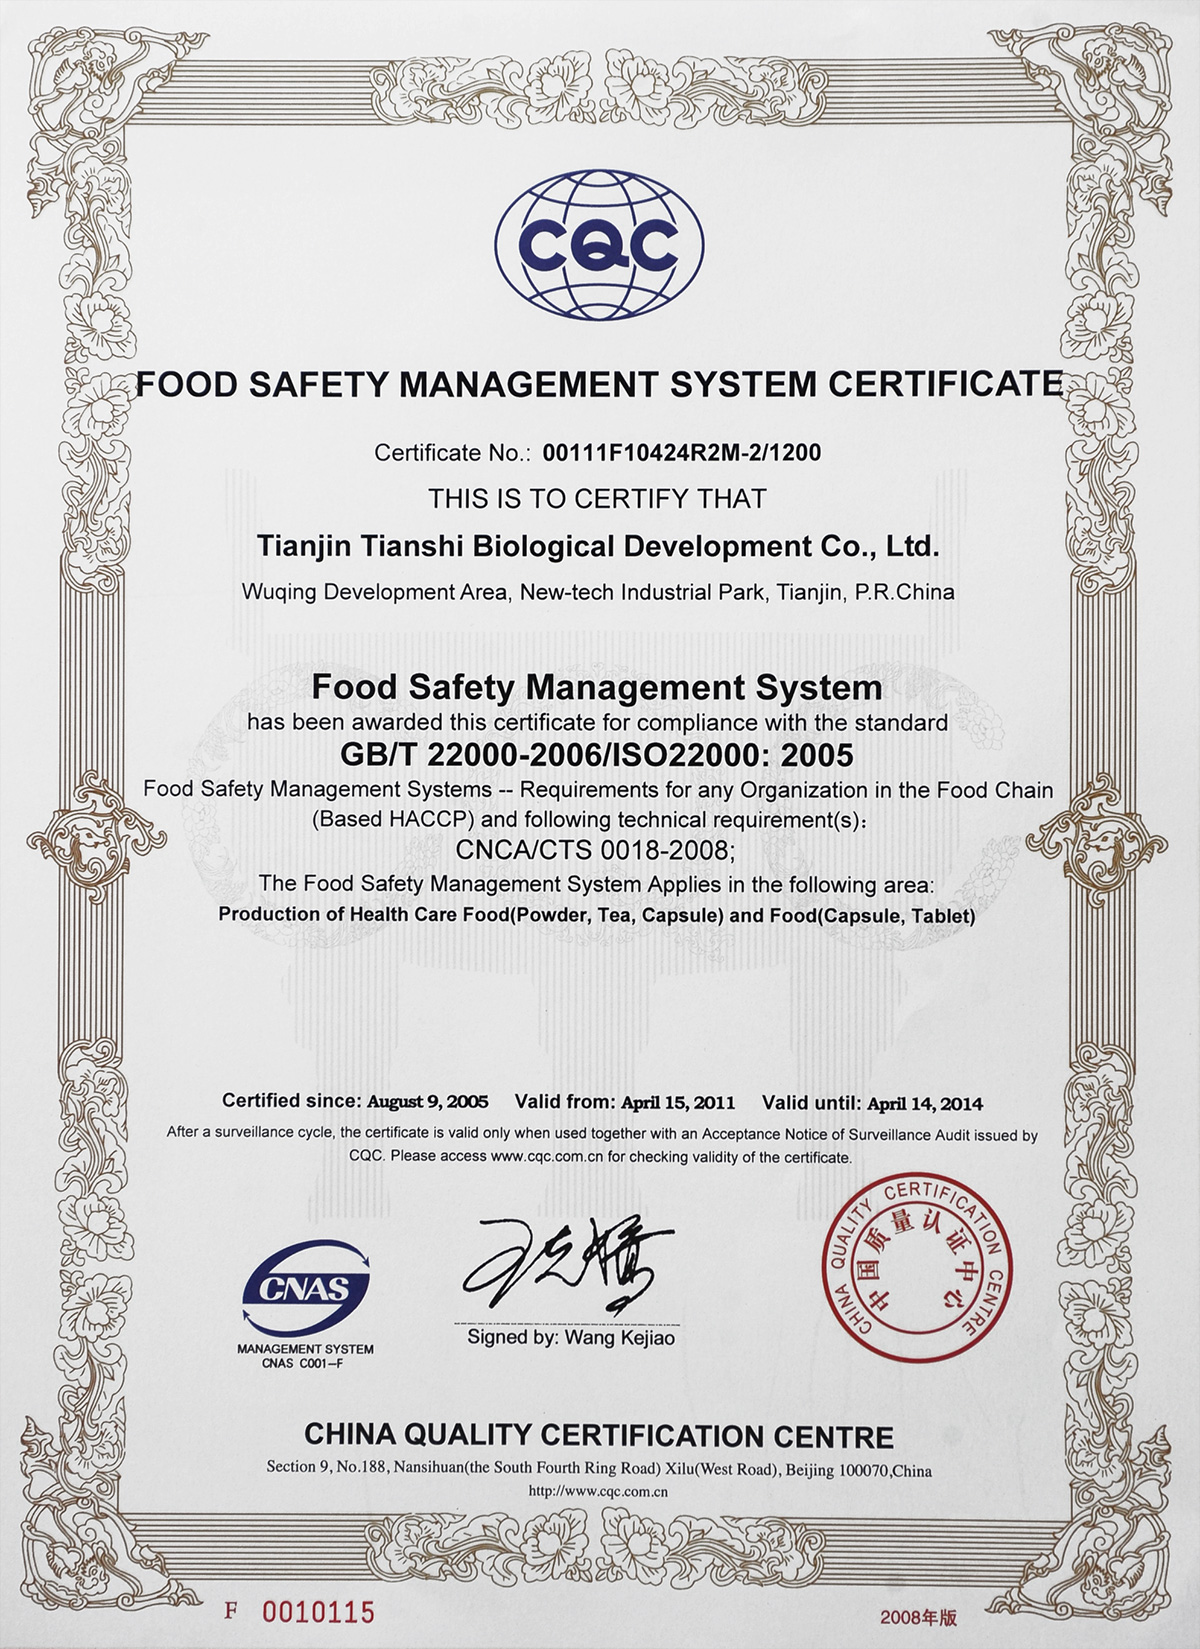 Сертификат Food safety фото